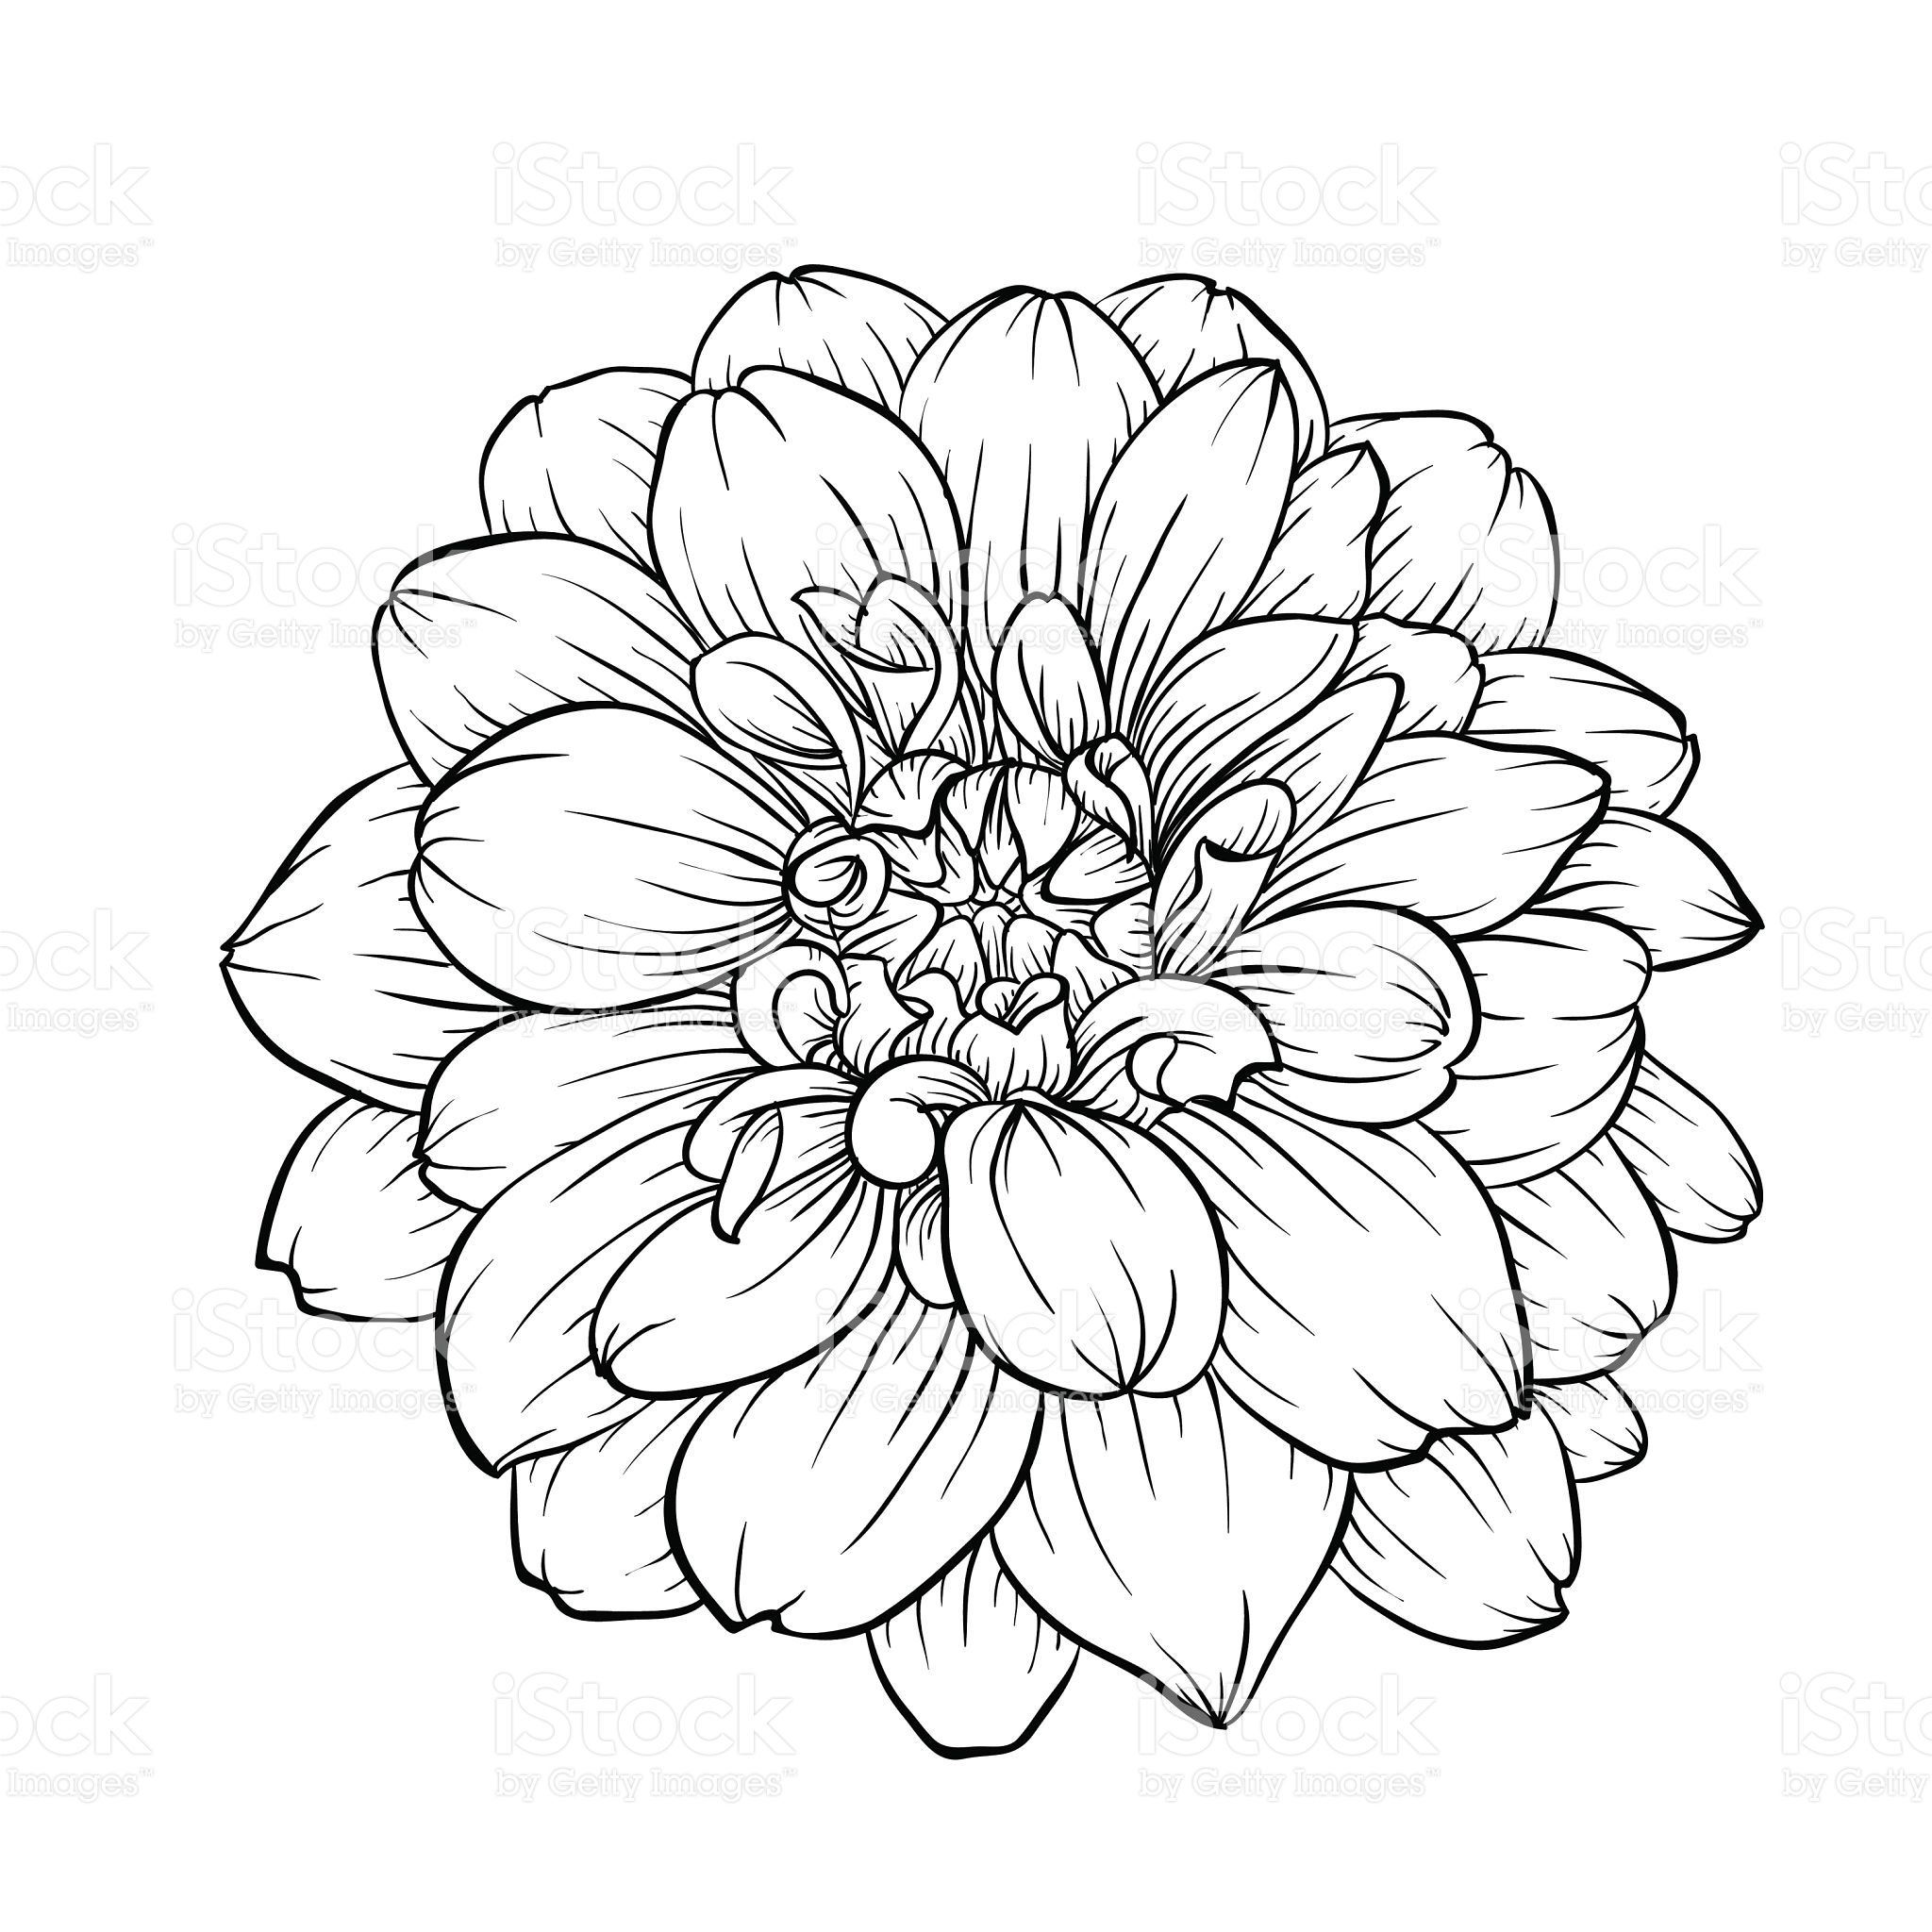 Flower Line Art Images: Beautiful Monochrome Black And White Dahlia Flower